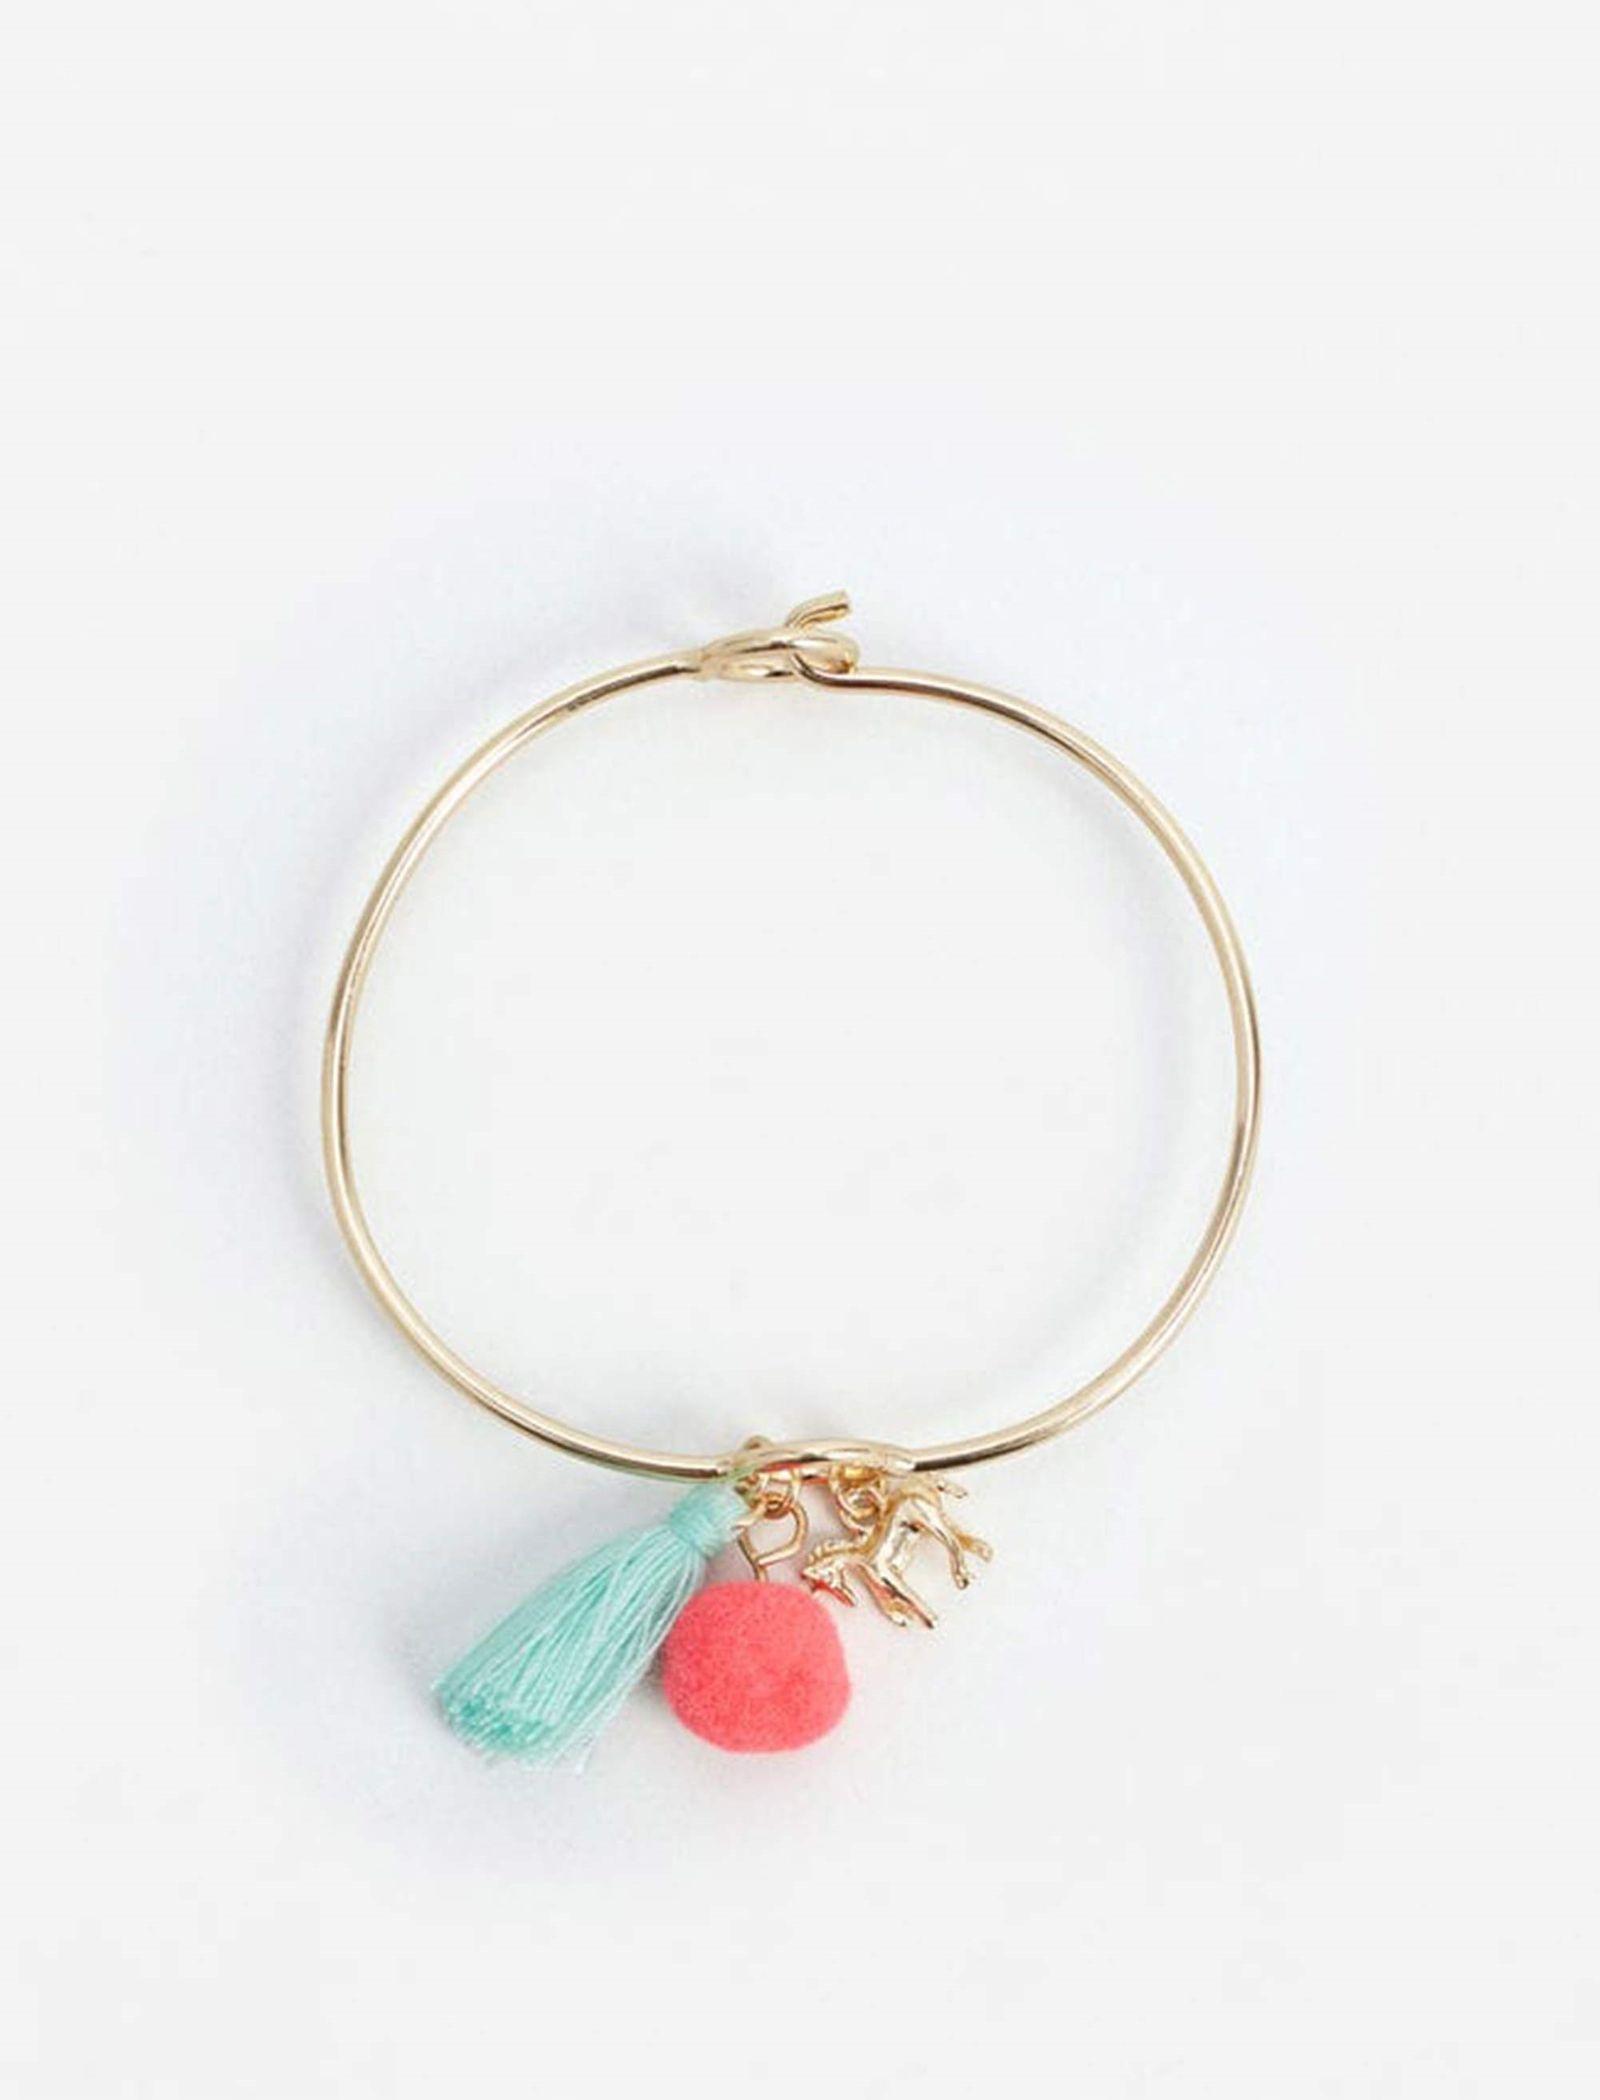 دستبند فلزی دخترانه - مانگو - طلايي - 1